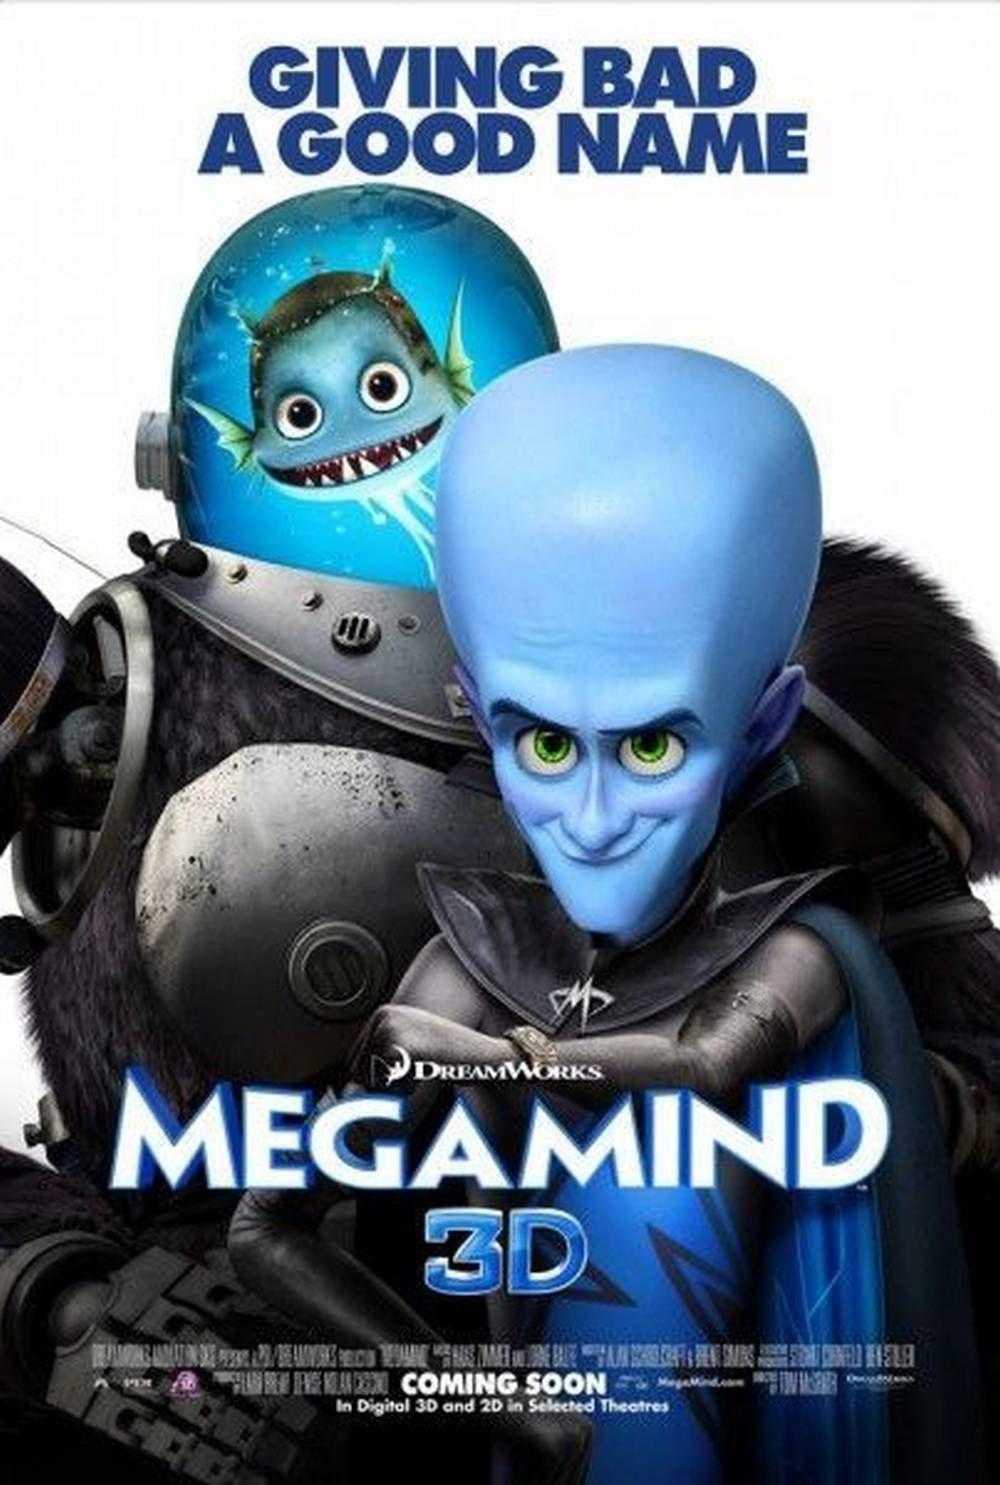 Megamind Movie Review - MoviesOnline